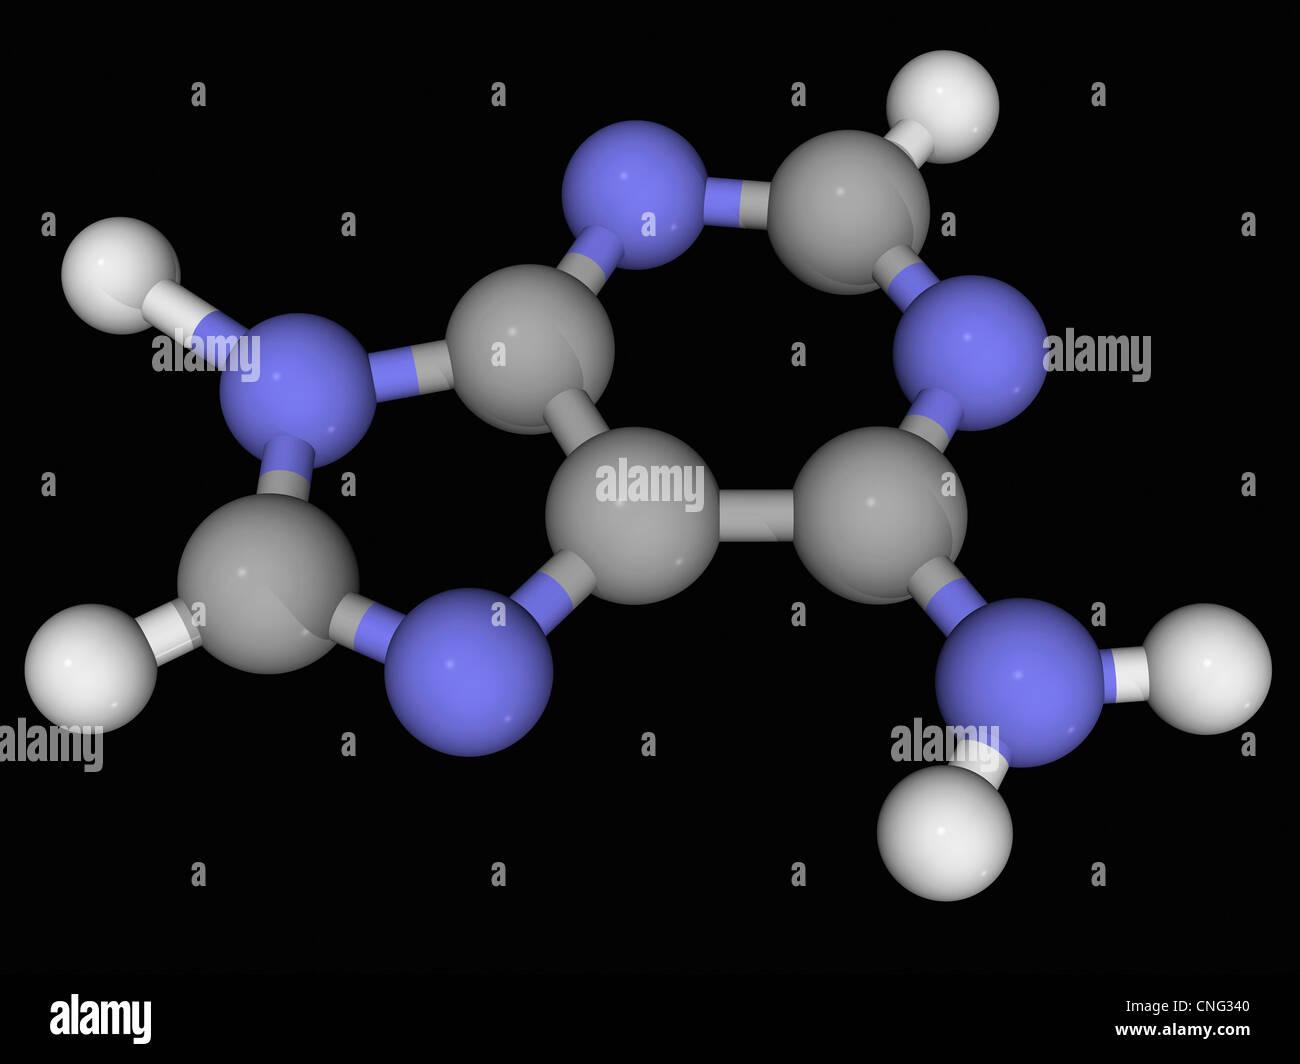 Adenine molecule - Stock Image